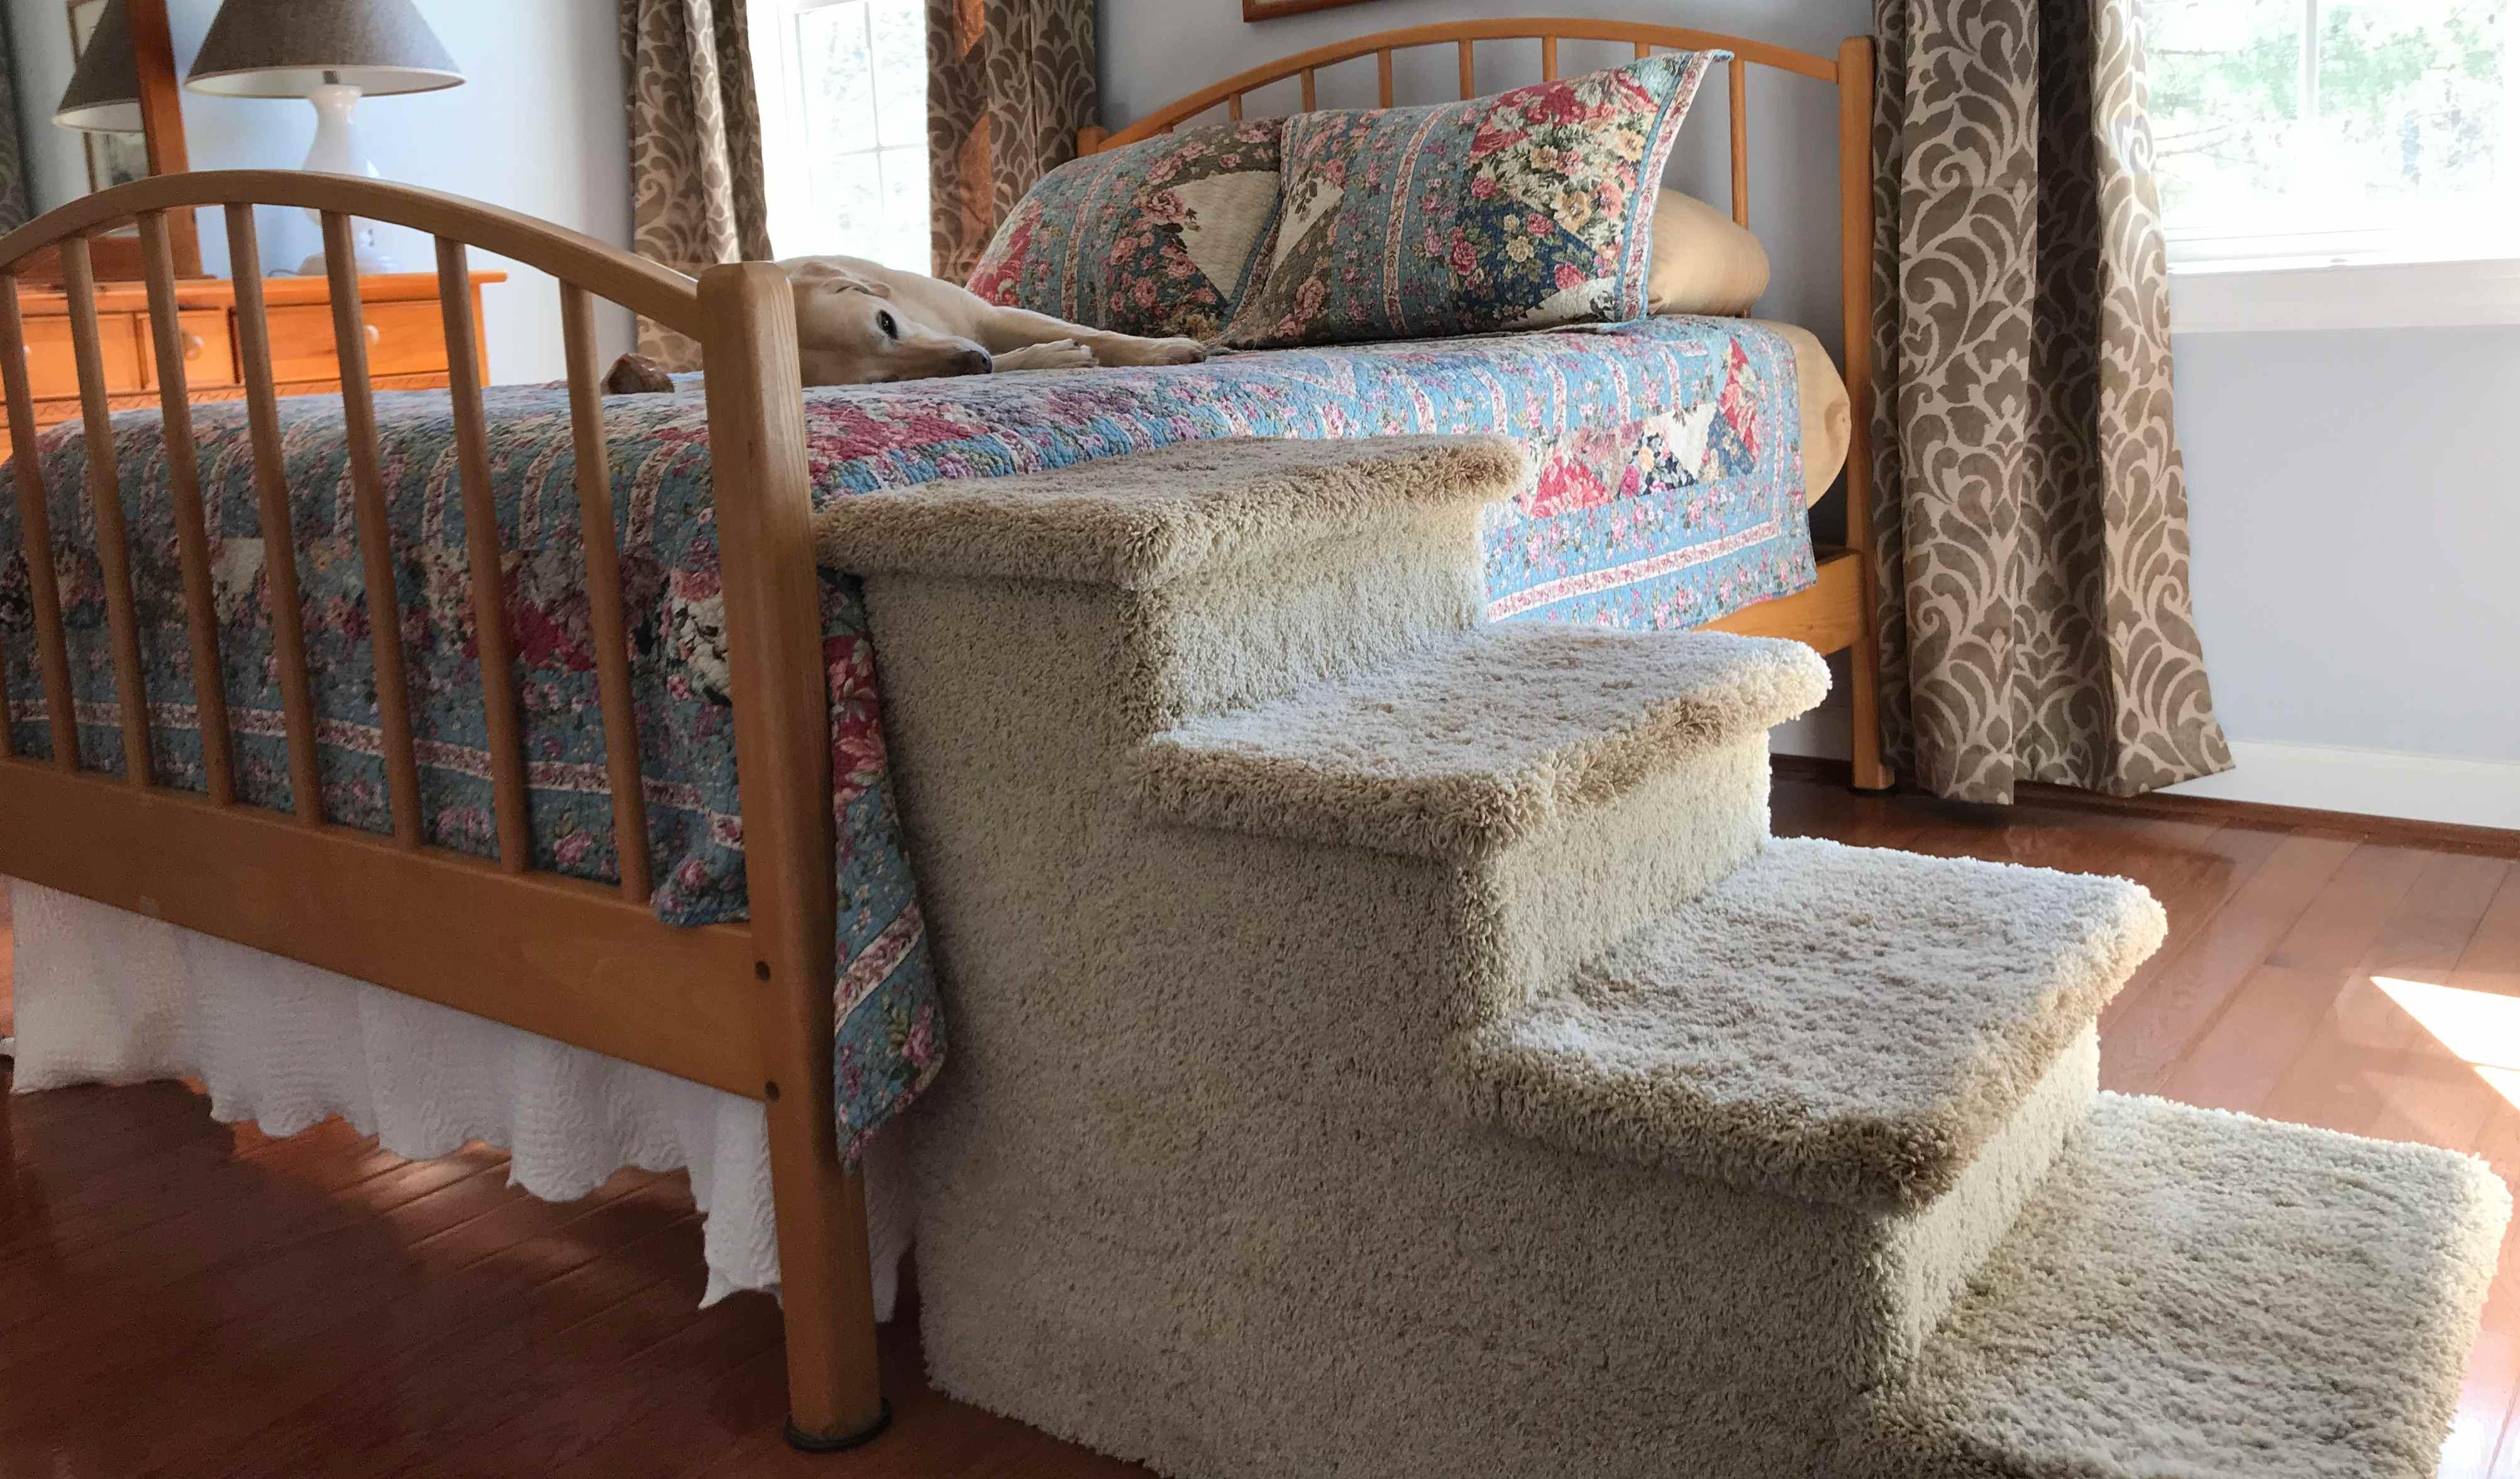 Pet Stairs - Quadruple Pet Step, Speckled Sand